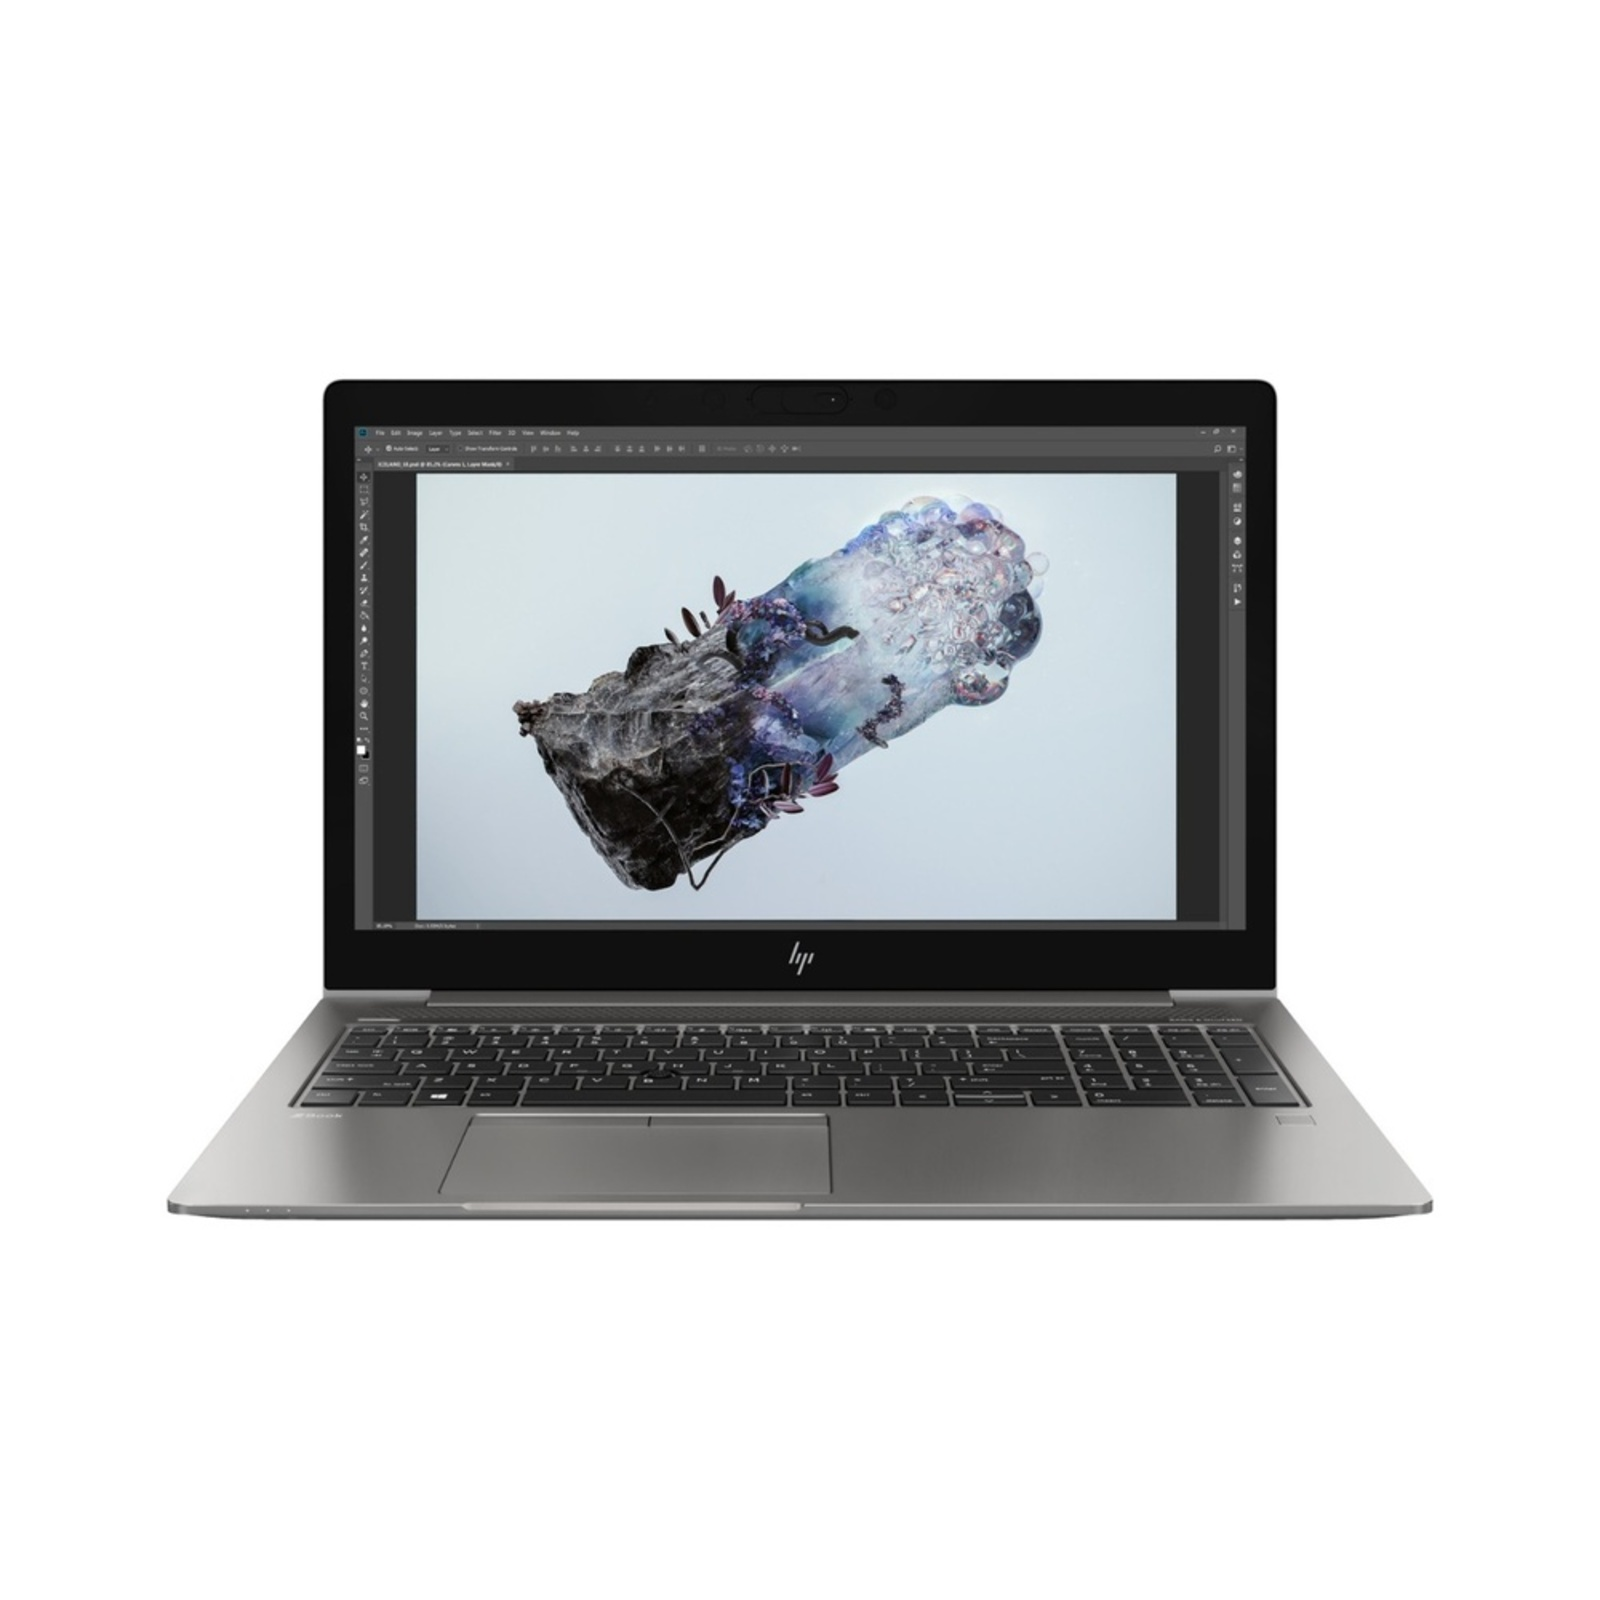 "HP ZBook 15u G6 15.6"" Full HD Mobile Workstation, i7-8665U, 16GB RAM, 512GB SSD, WX3200, Windows 10 Professional"